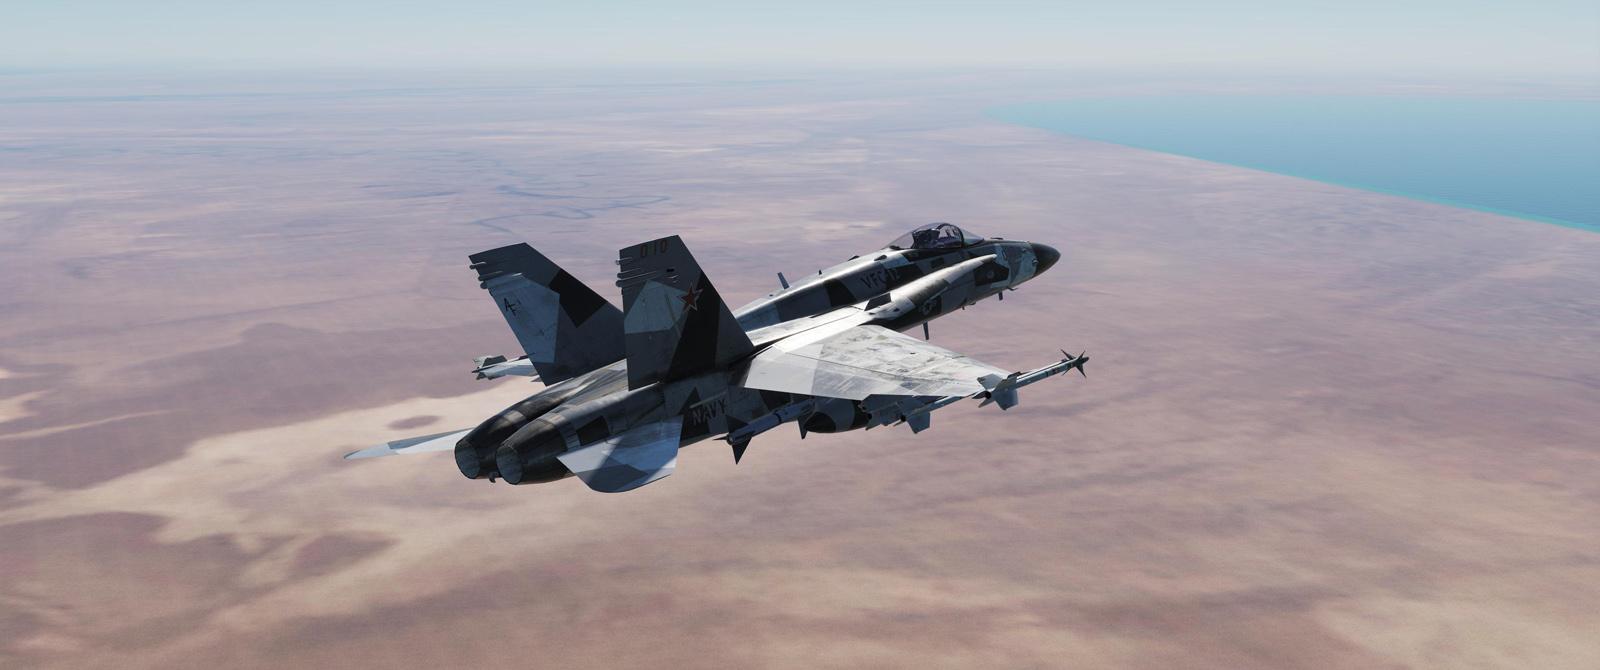 DCS F/A-18C - Flight Sims - Mudspike Forums